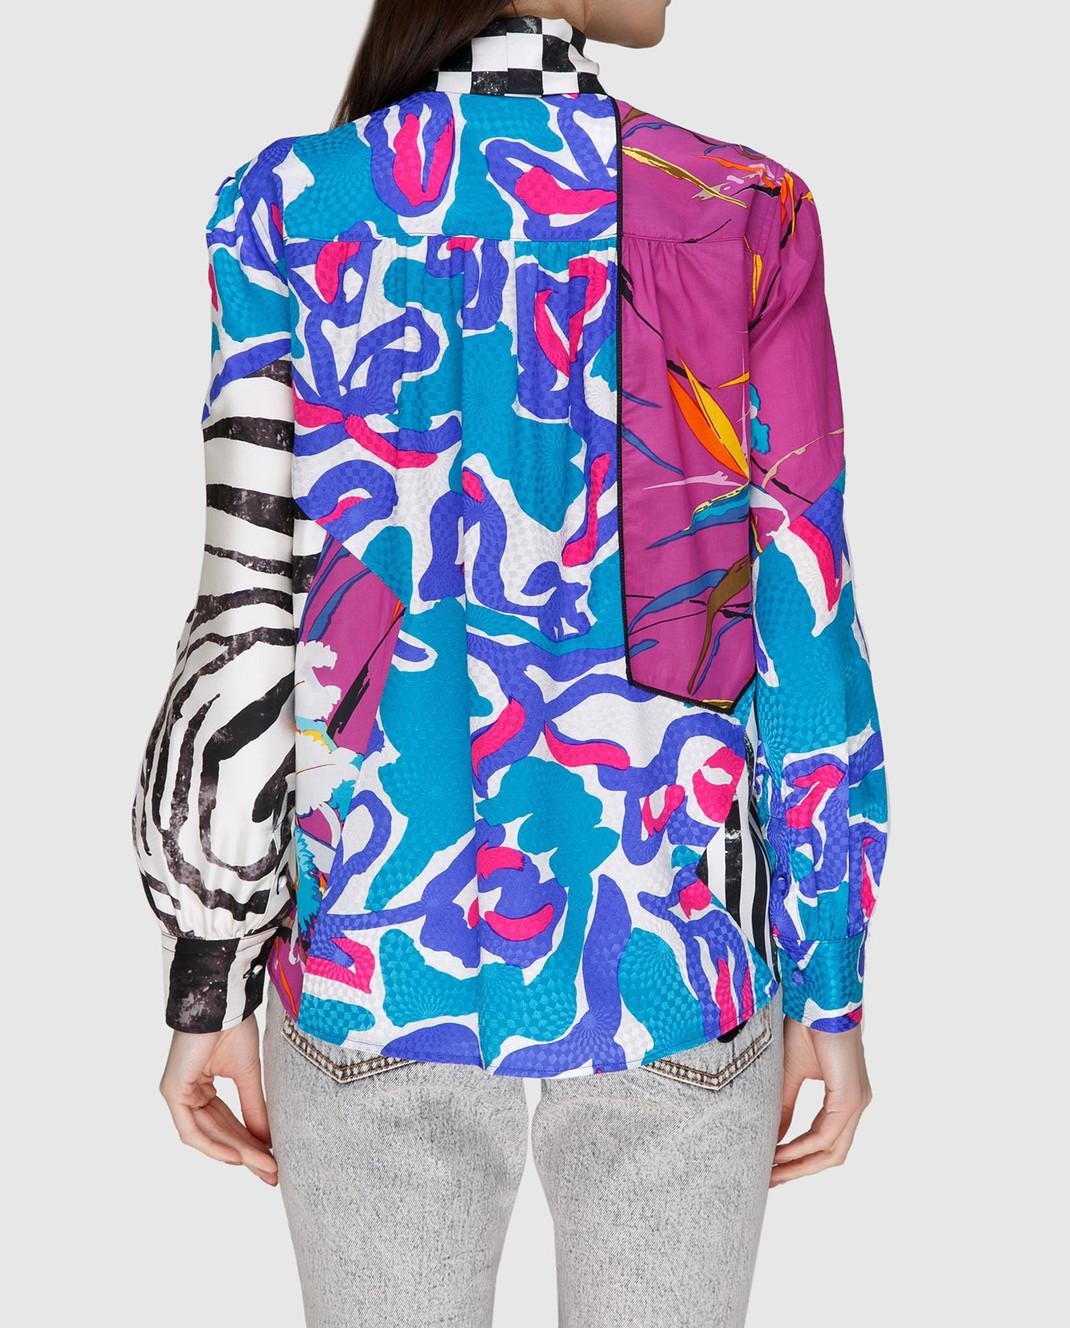 Marc Jacobs Блуза из шелка W51650646 изображение 3